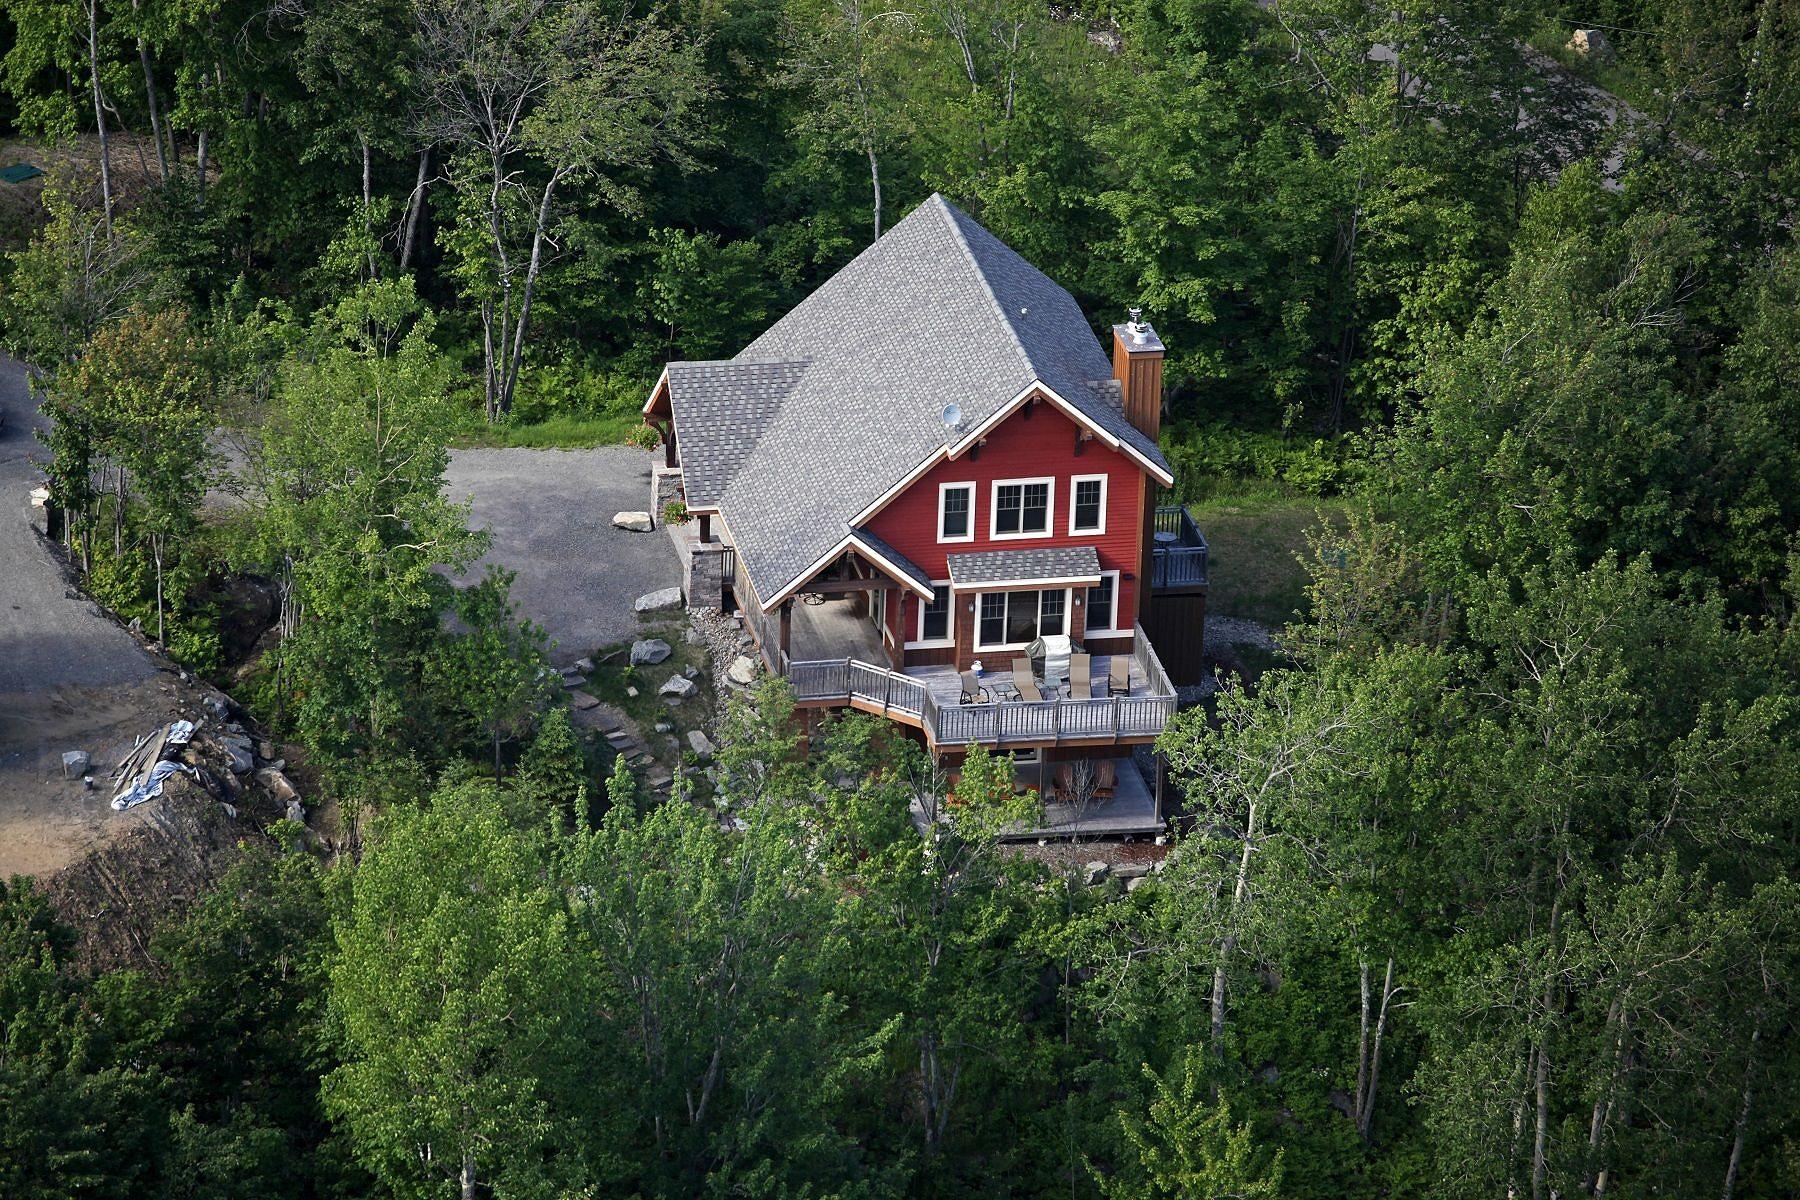 Частный односемейный дом для того Продажа на Mont-Tremblant, Laurentides 115 Ch. de l'Aventure Mont-Tremblant, Квебек, J8E0A9 Канада